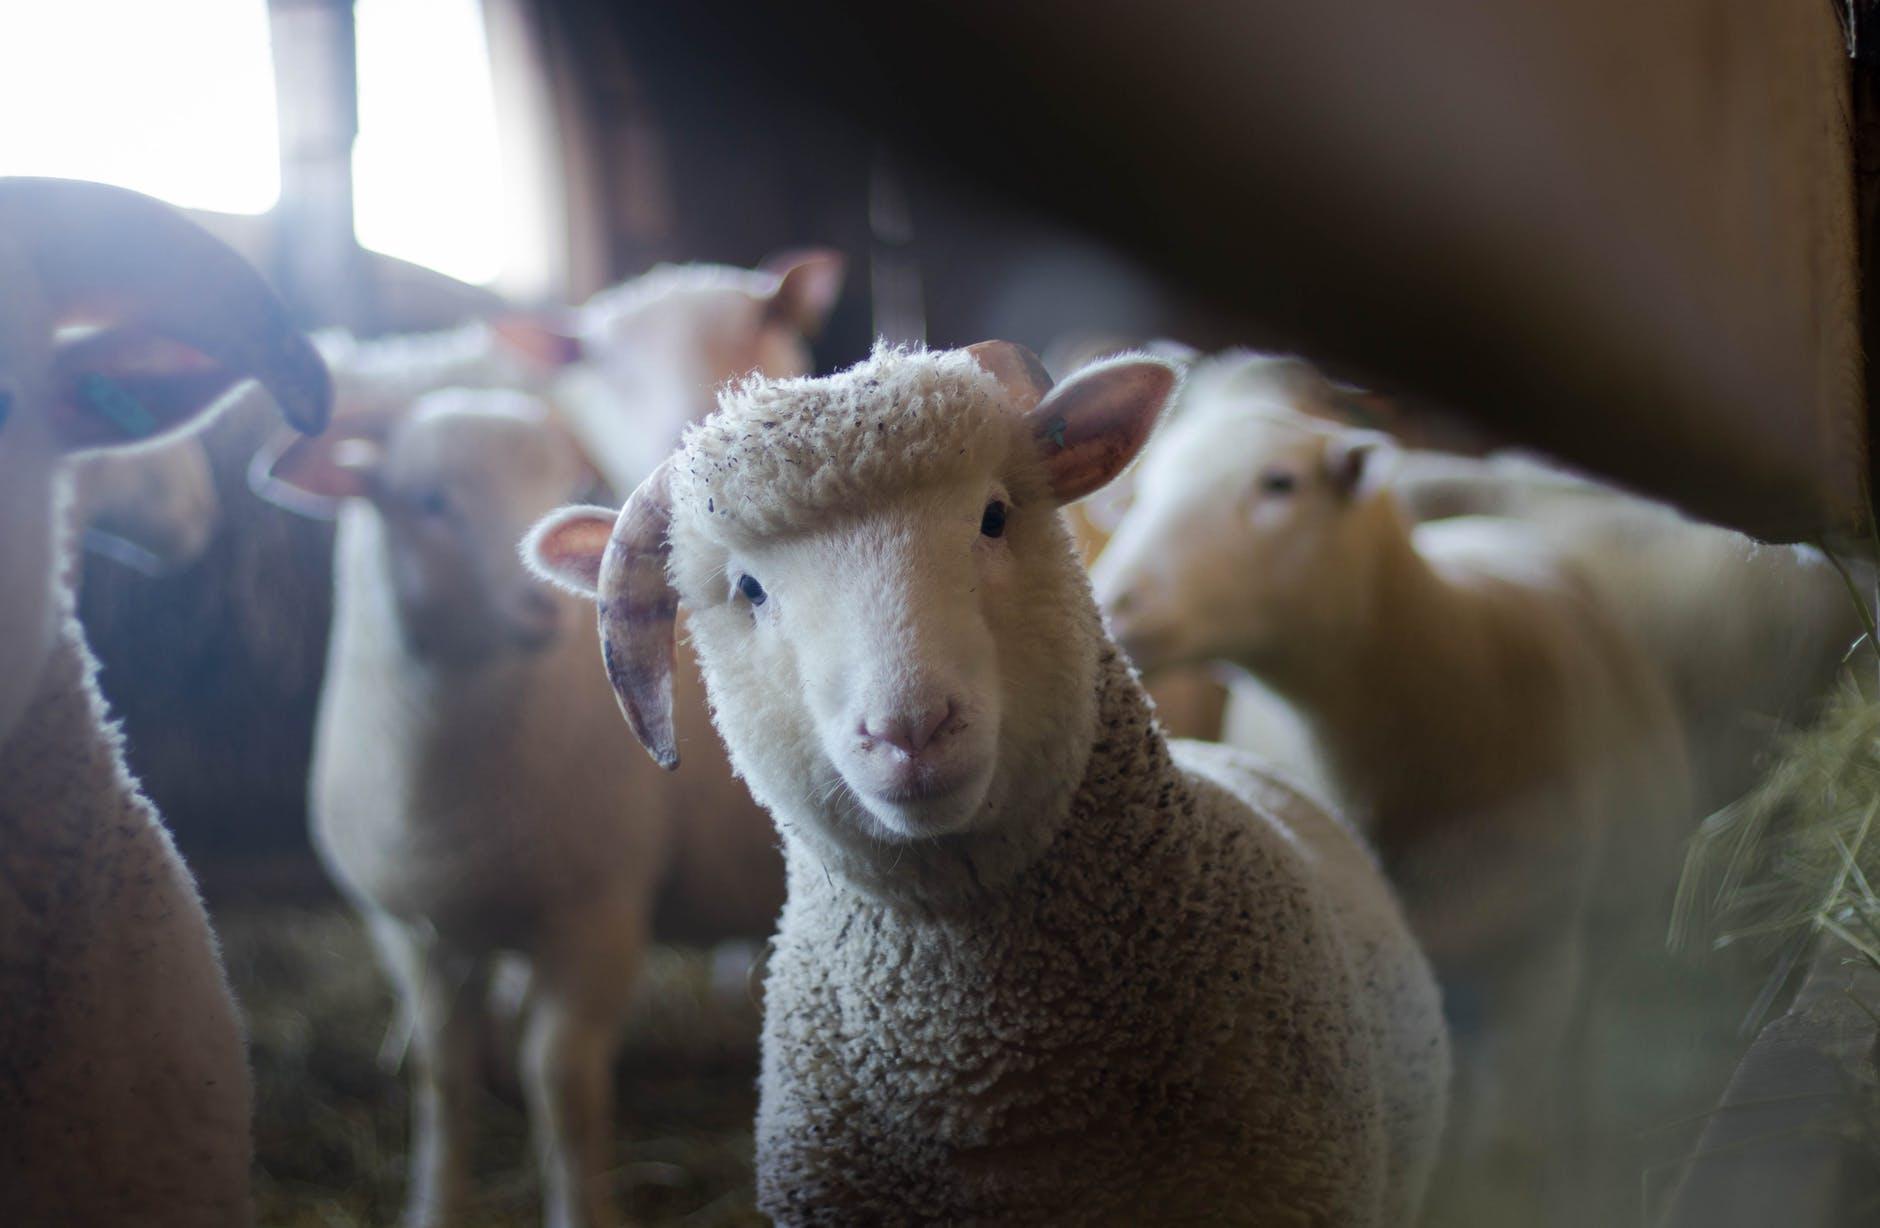 8 Advantages of Farming App Development for Your Farming Business